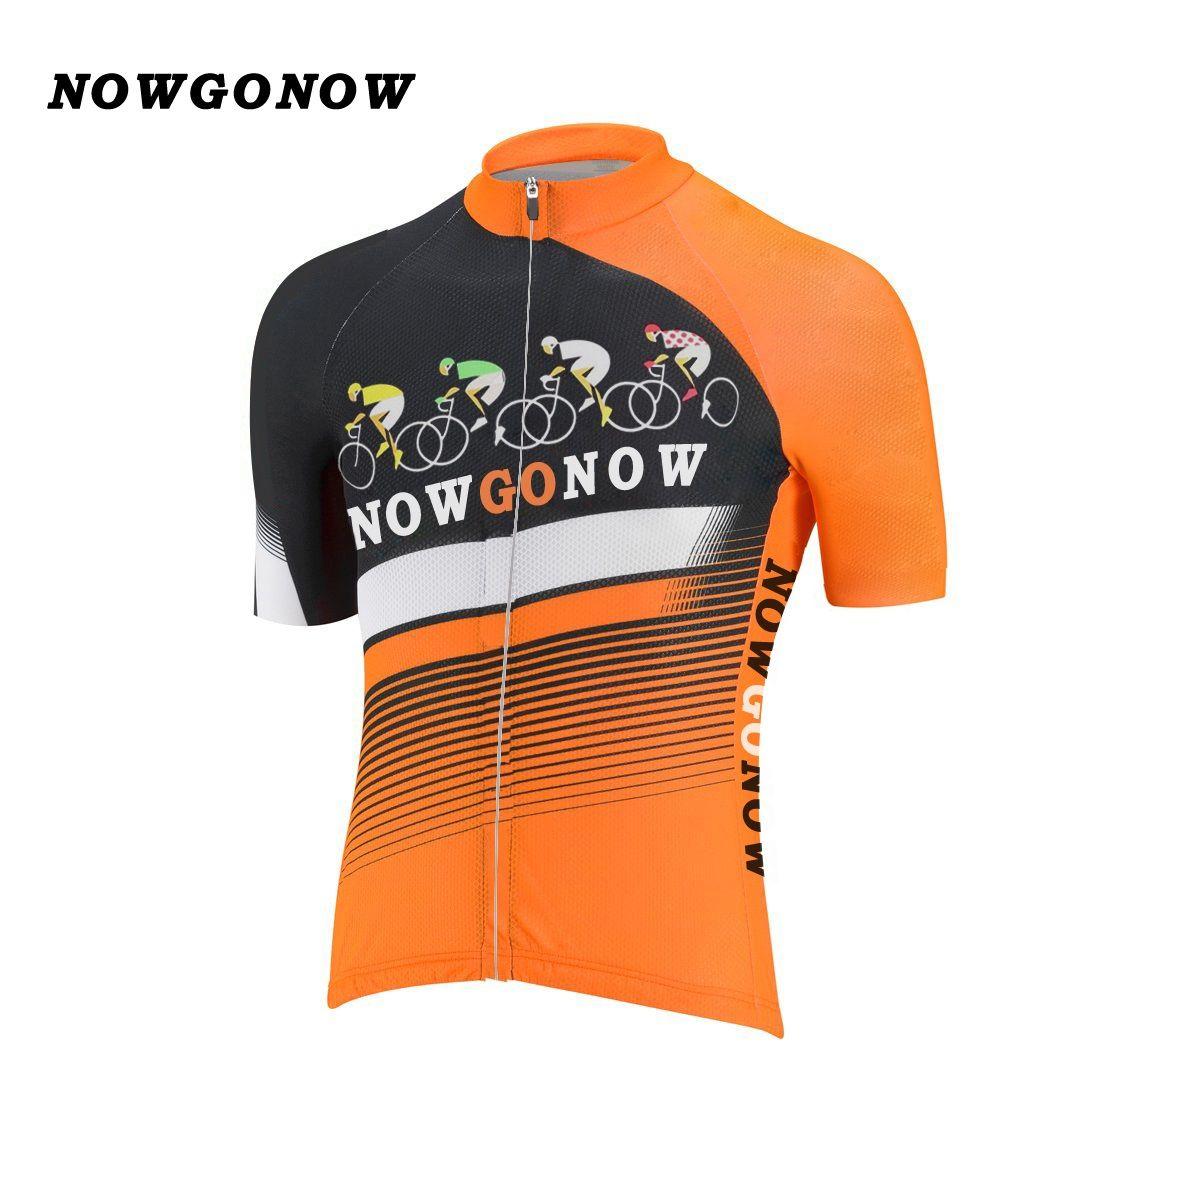 Wholesale Can Custom Men 2017 Cycling Jersey Pro Team Clothing Bike Wear  Orange Black NOWGONOW Tops Road Mountain Triathlon Summer Quick Dry  Bugatchi Shirts ... 2cb70fd3d